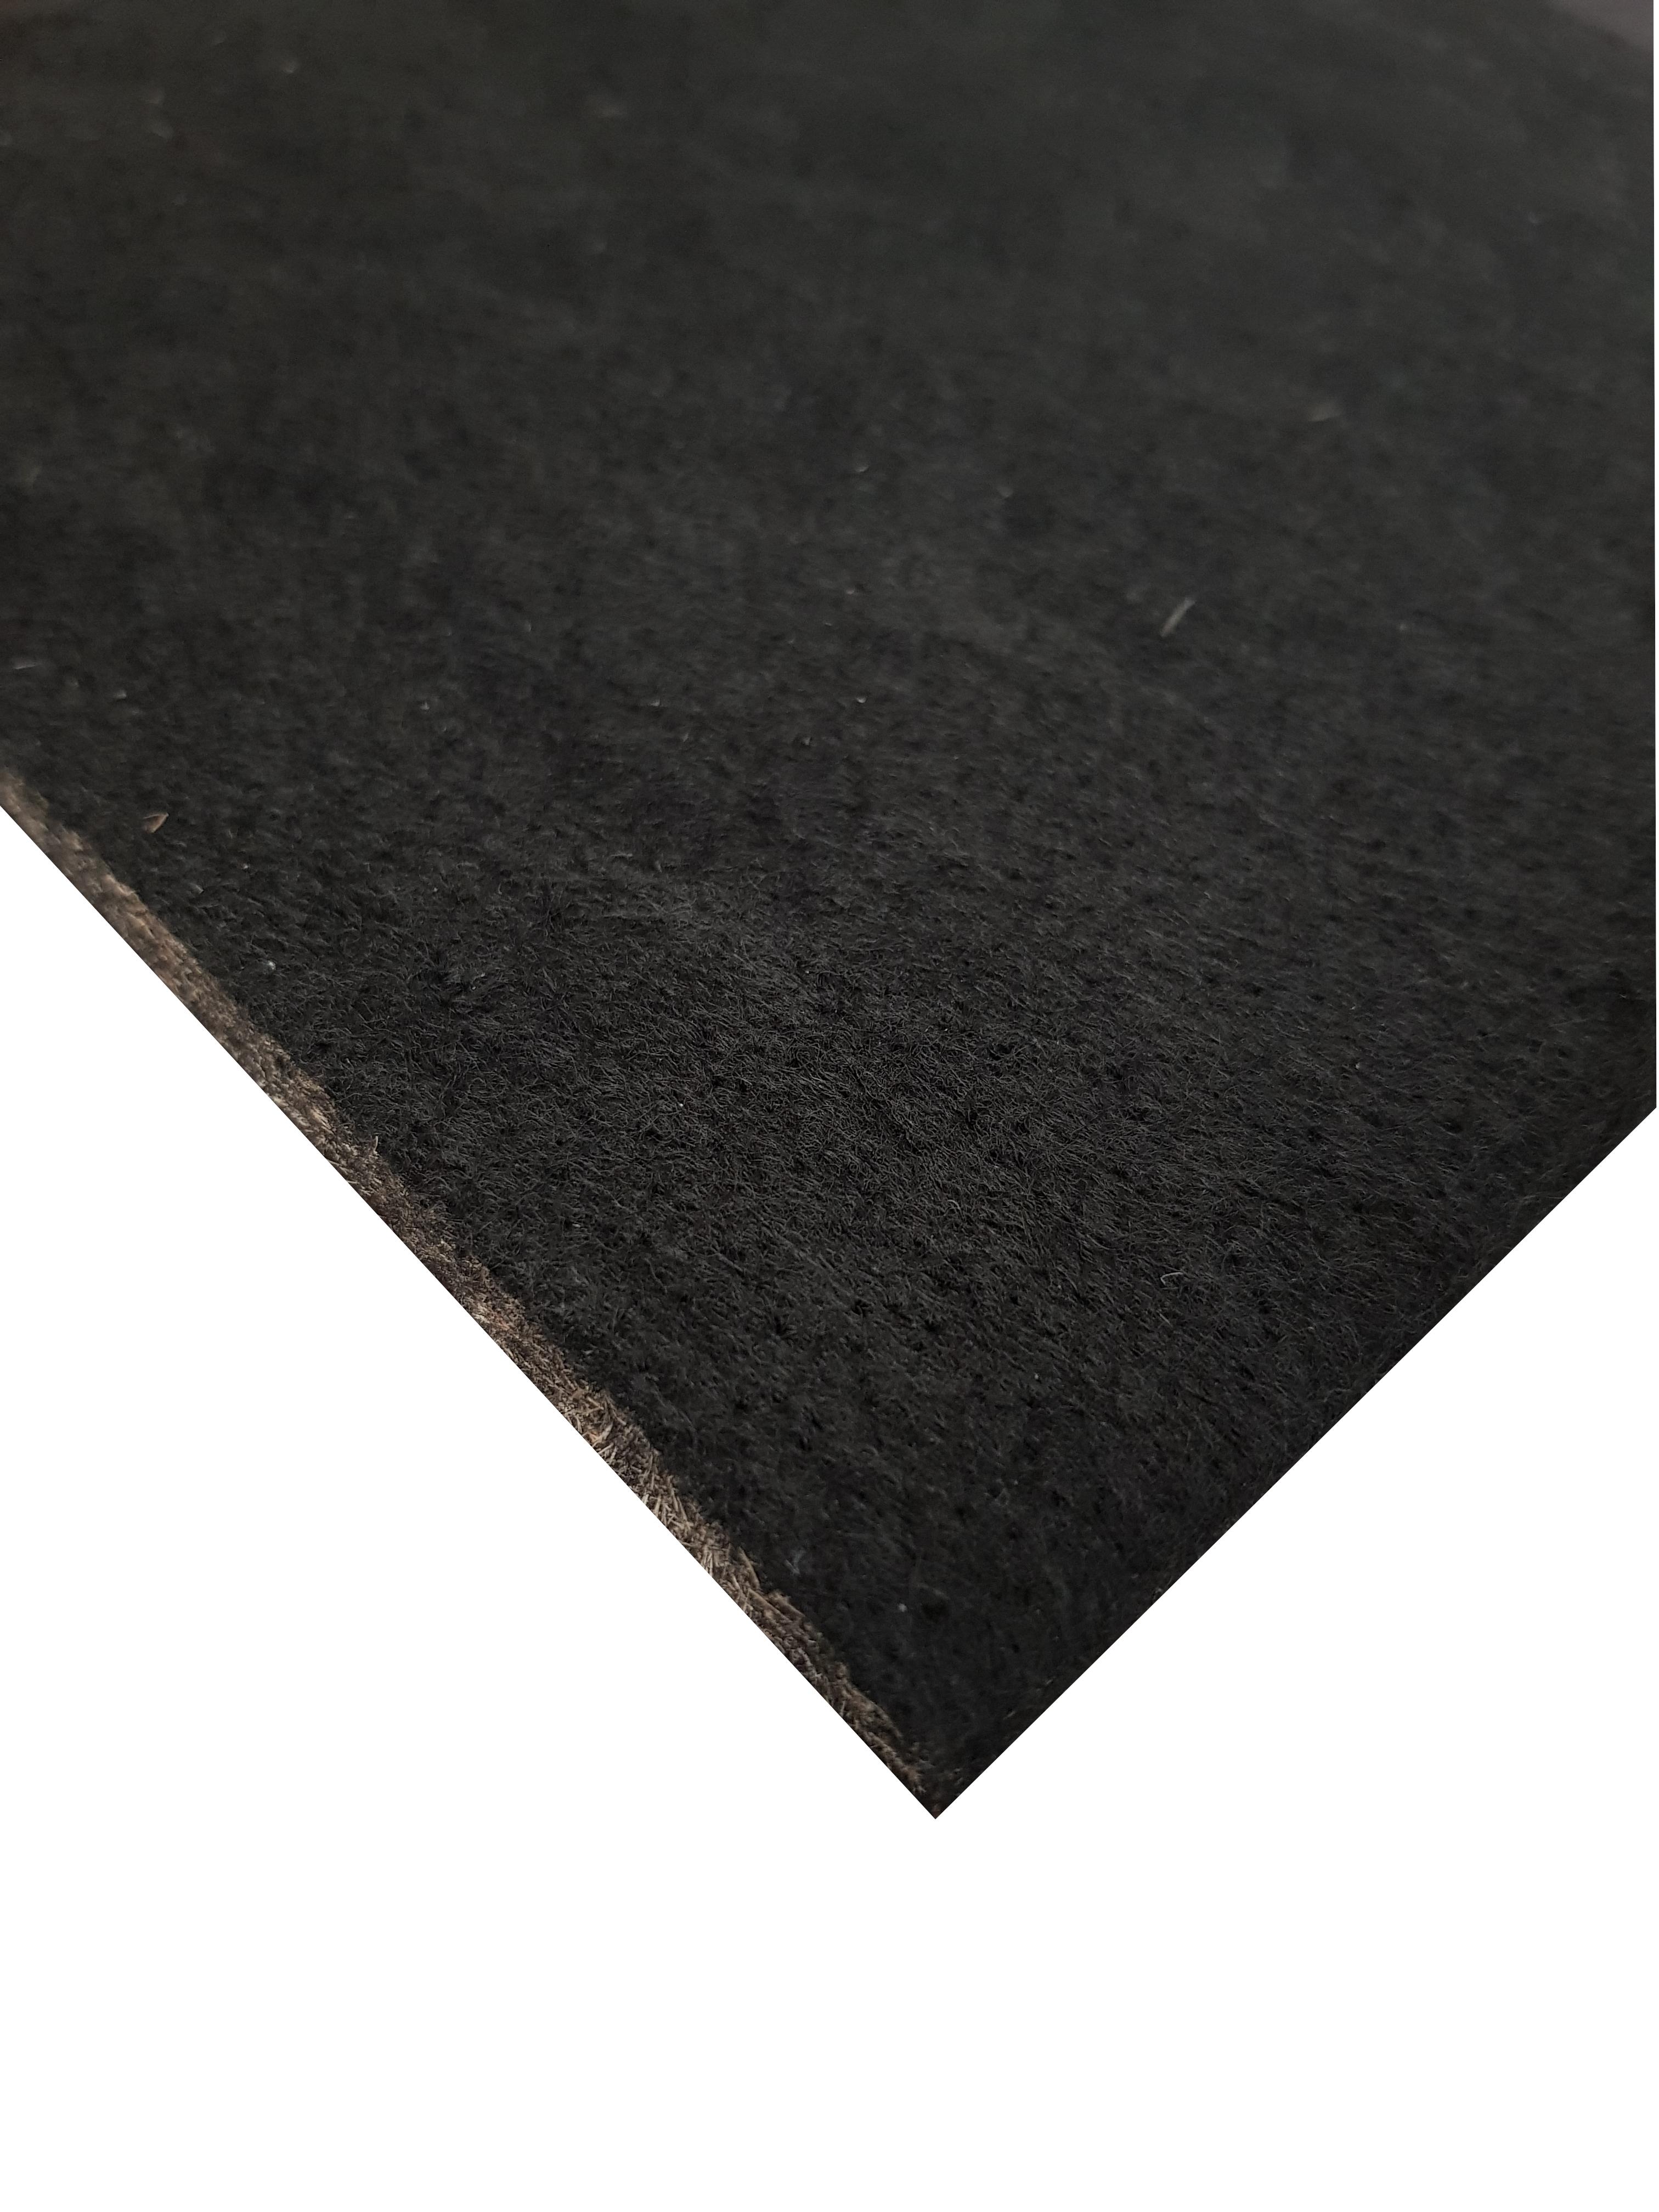 Unterbau Kenaf - Vlies braun schwarz, ca. 10mm stark